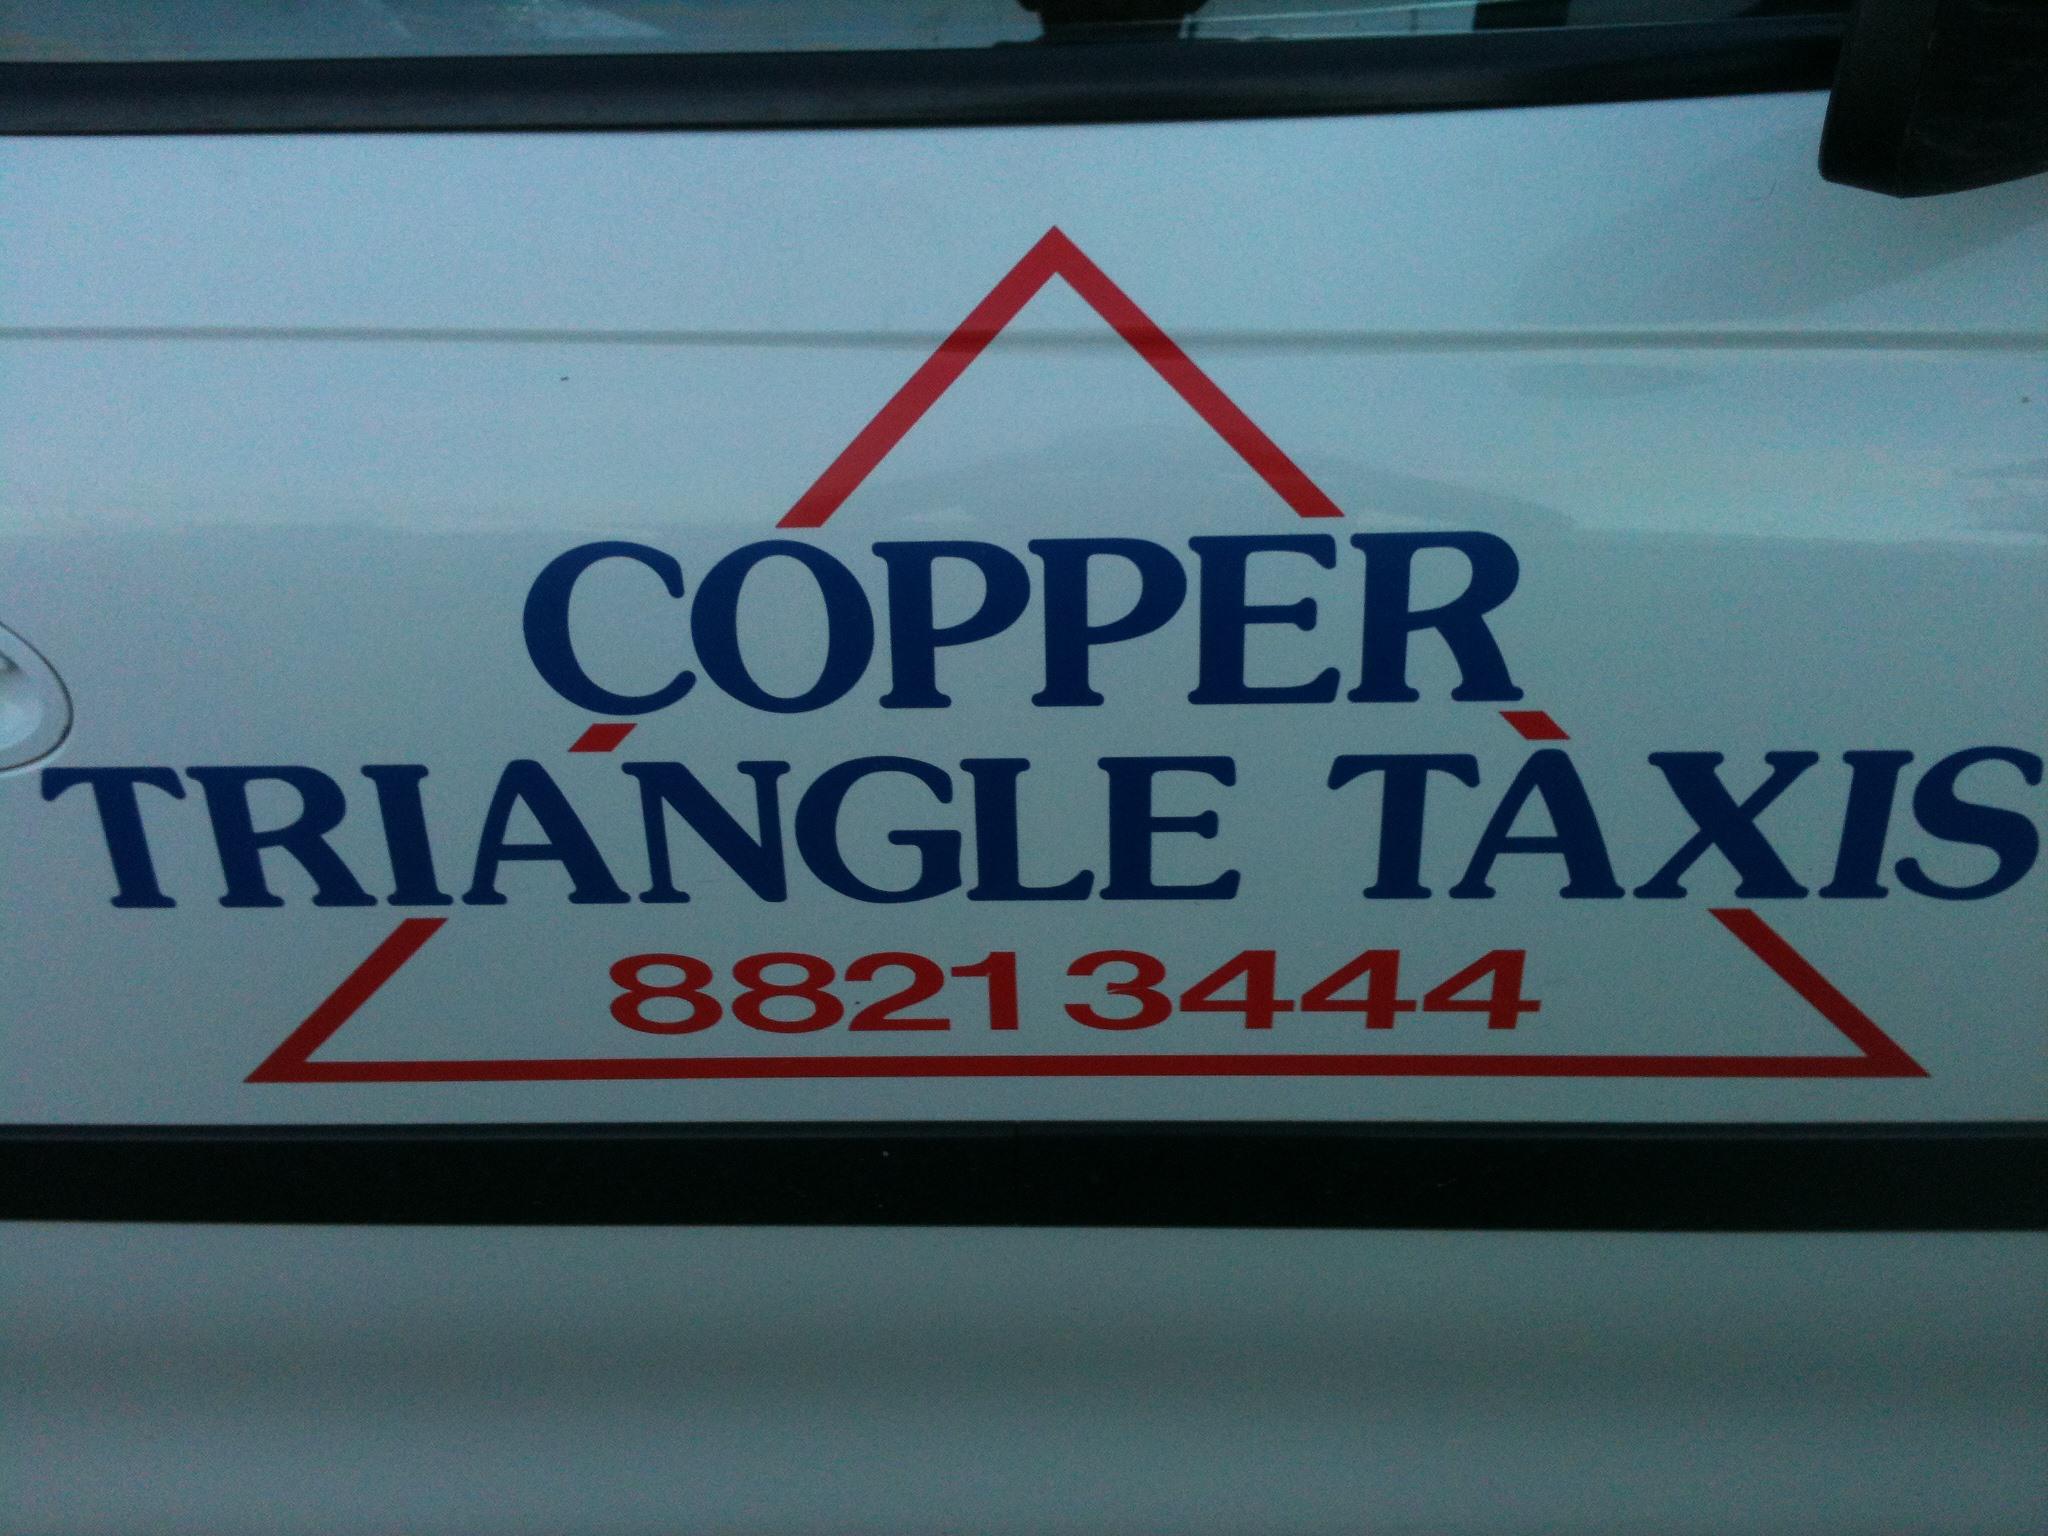 Copper Triangle Taxis